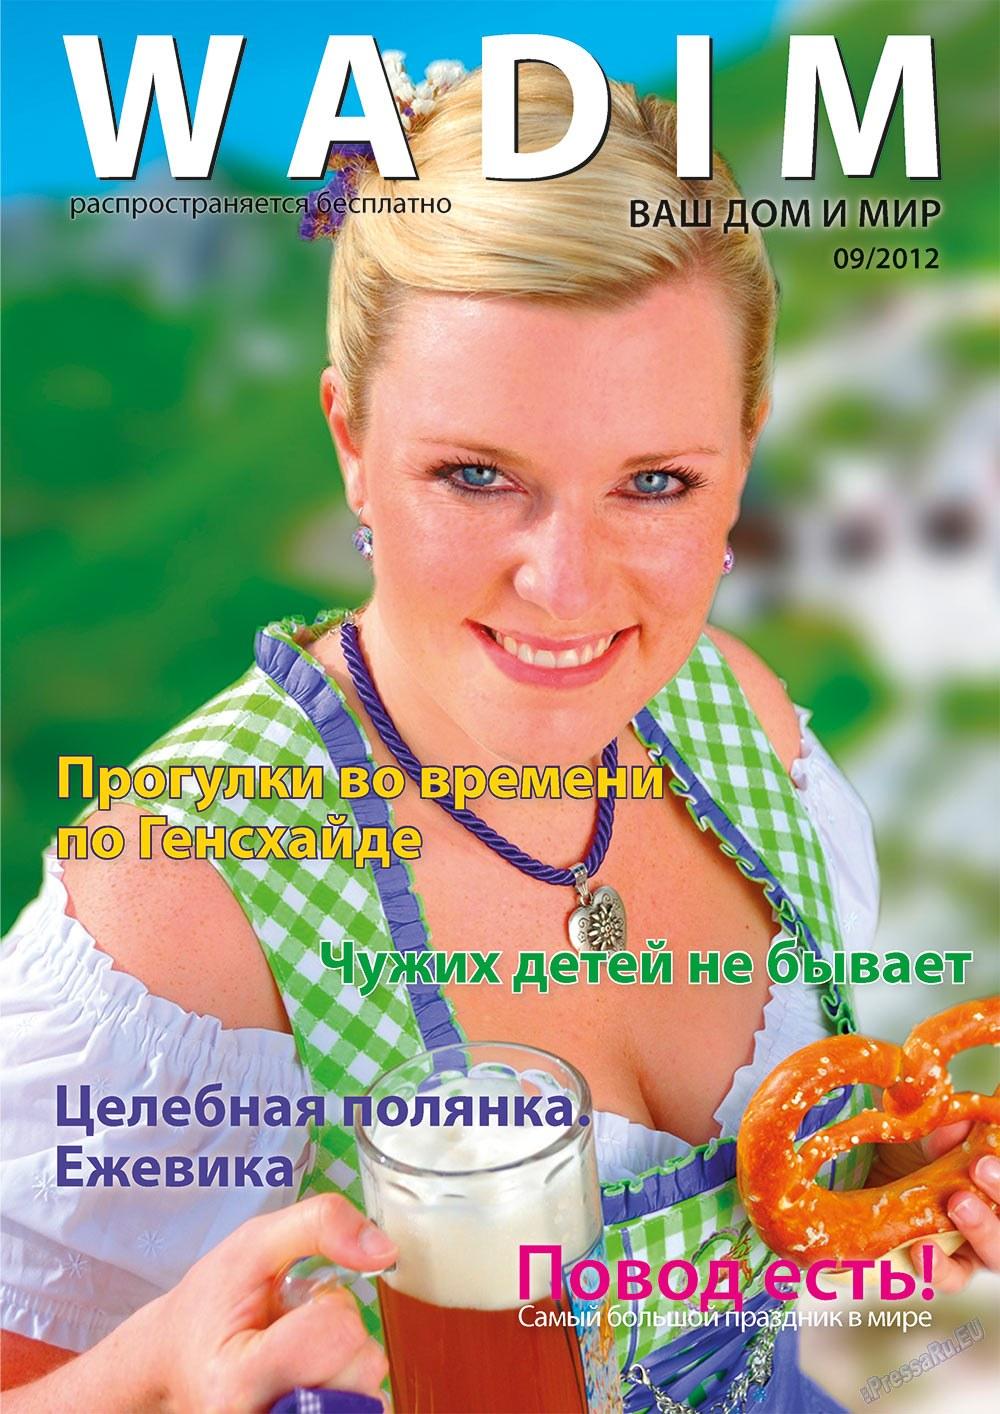 Wadim (журнал). 2012 год, номер 9, стр. 1